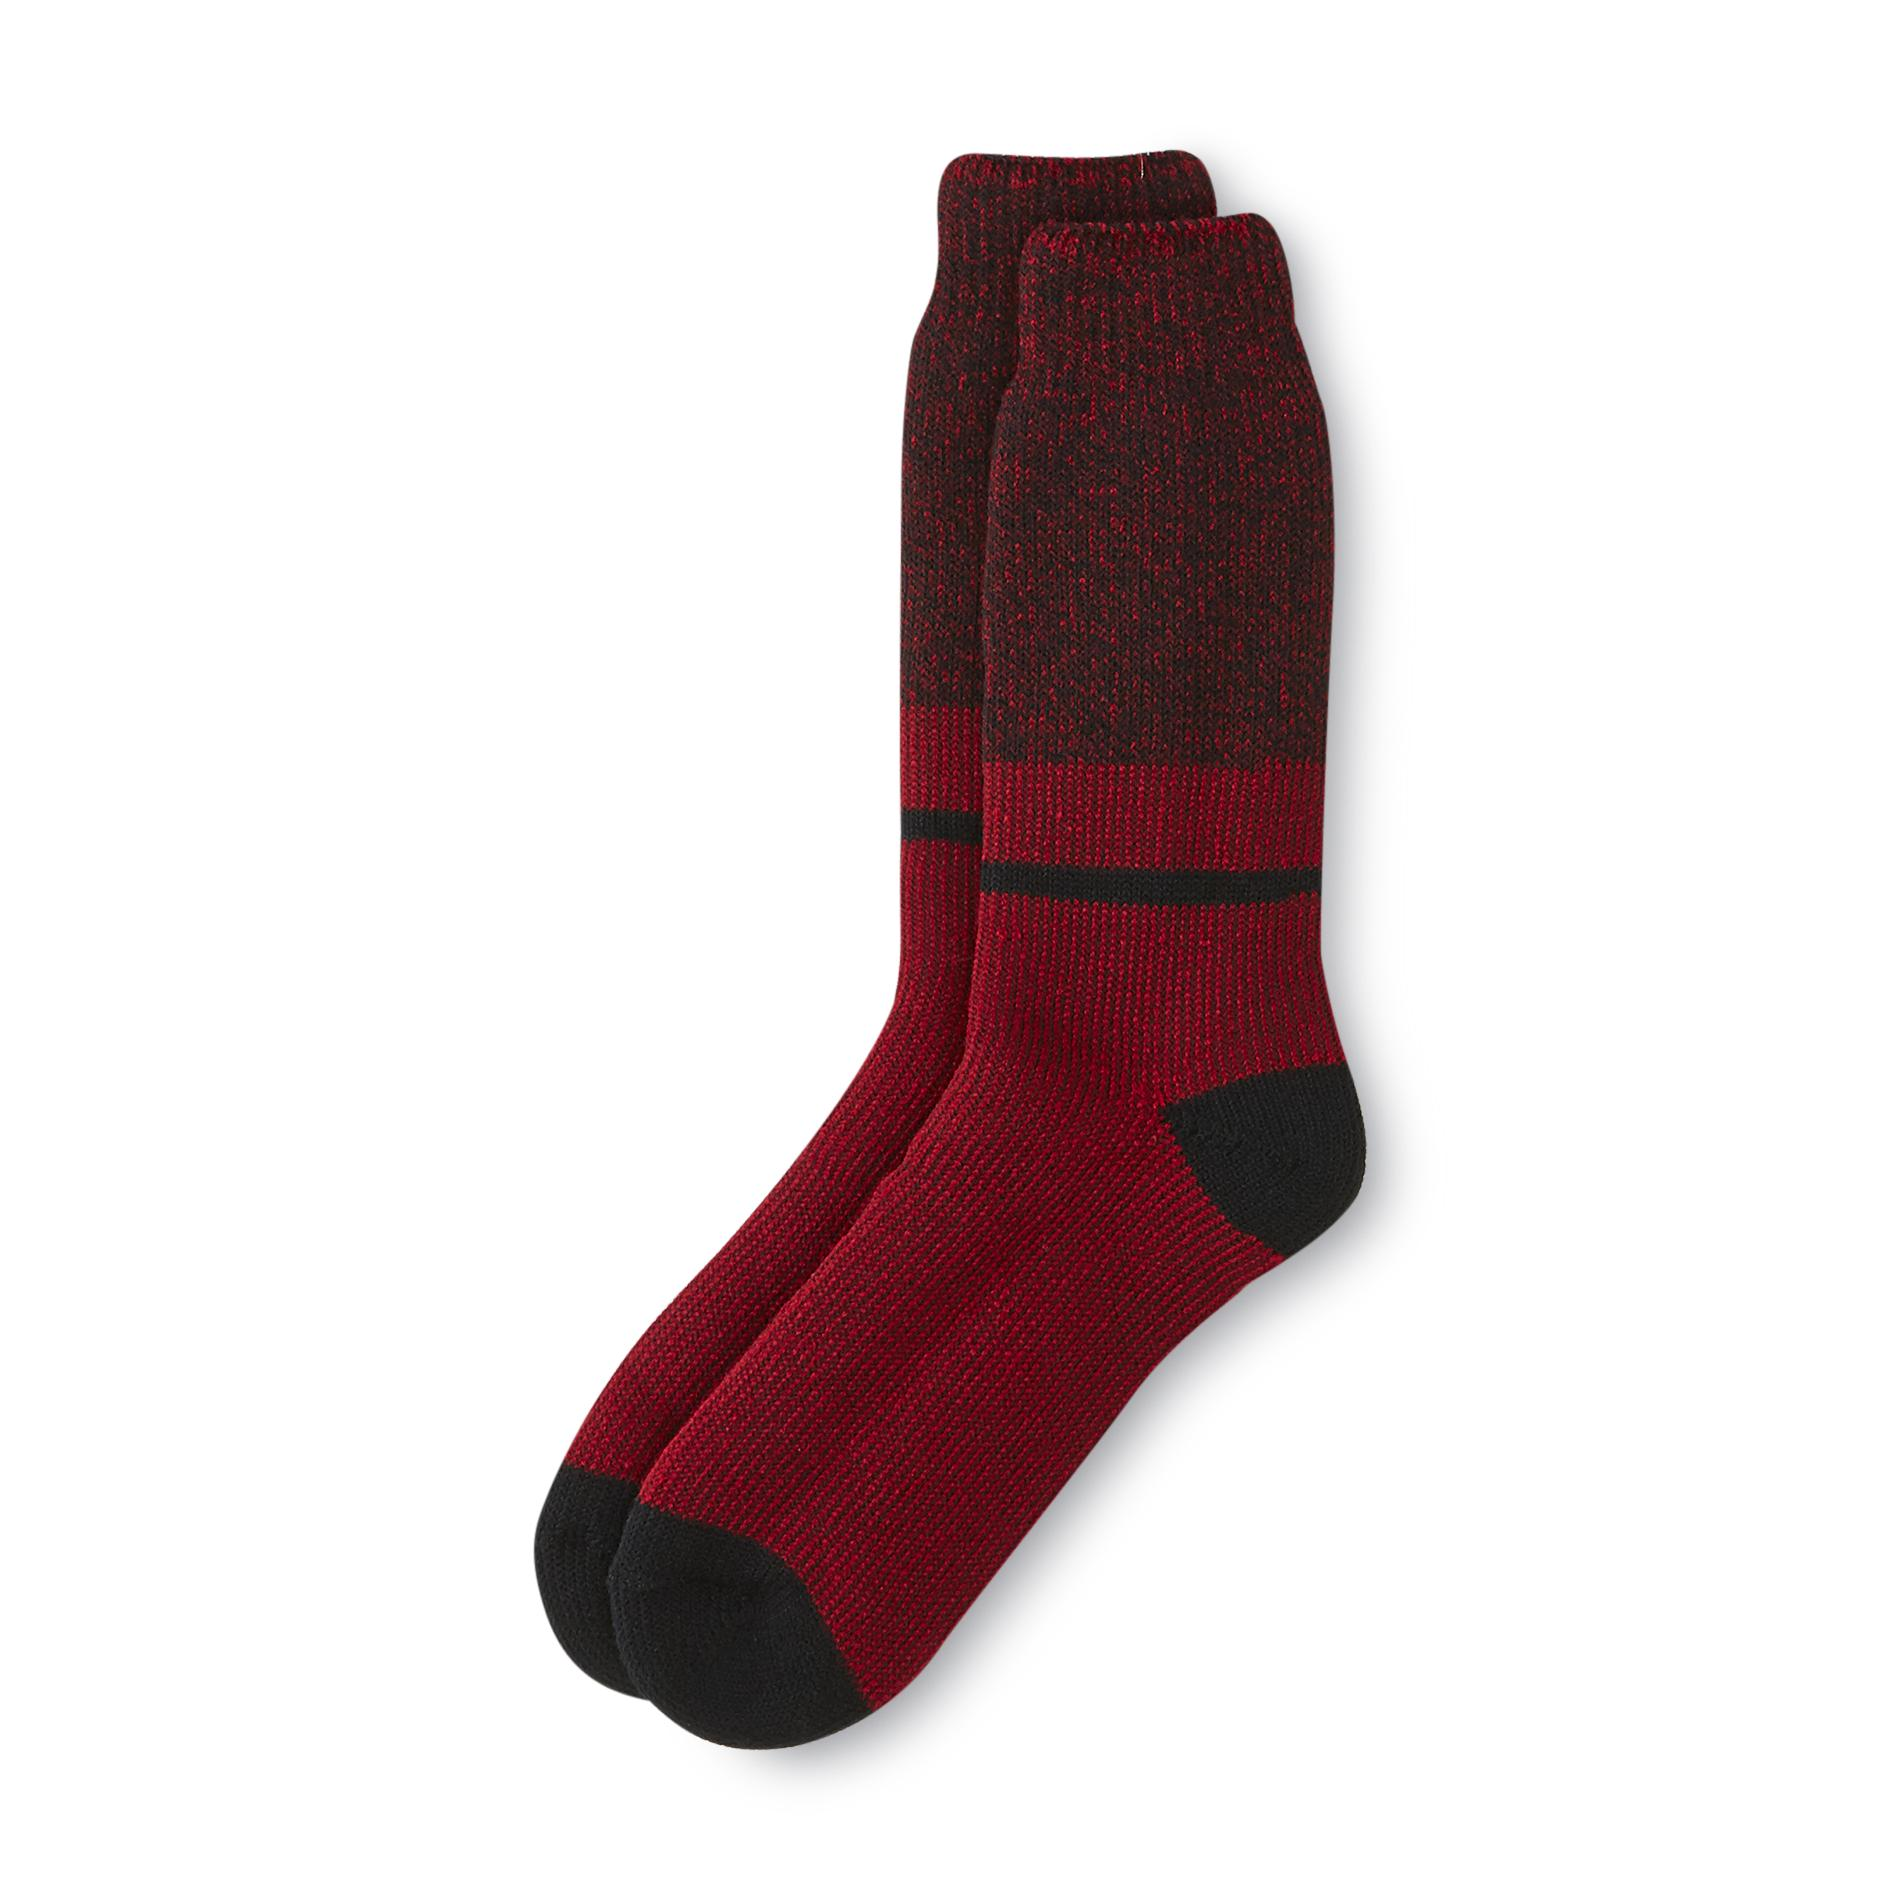 Kodiak Men's Heat Plus Thermal Crew Socks - Striped